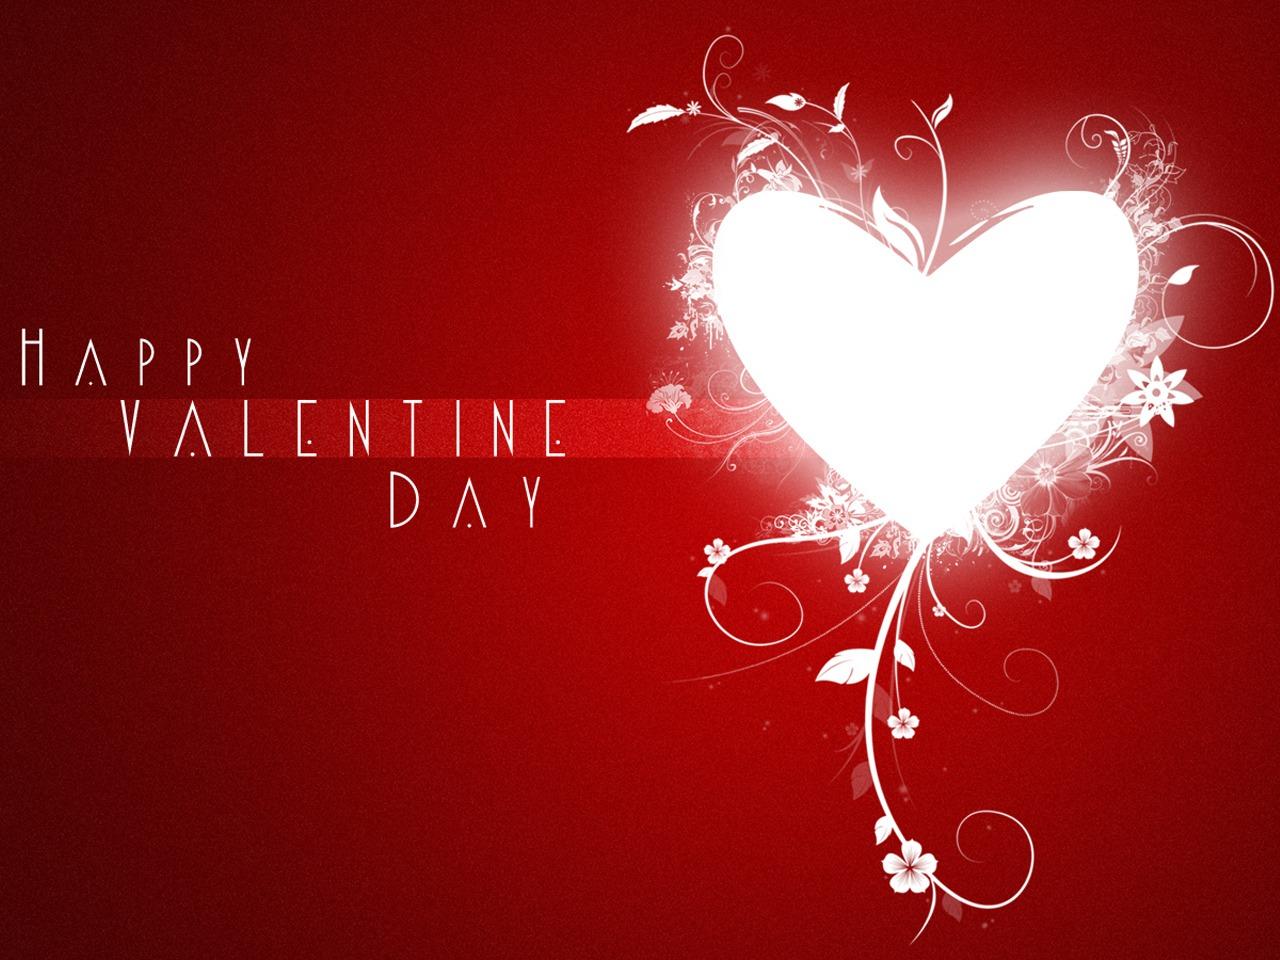 http://3.bp.blogspot.com/-2IFng88DpZw/UPTNyMRXSwI/AAAAAAAAA24/19sGbf9Oo9E/s1600/Valentine+Day+2013+Wallpapers.jpg